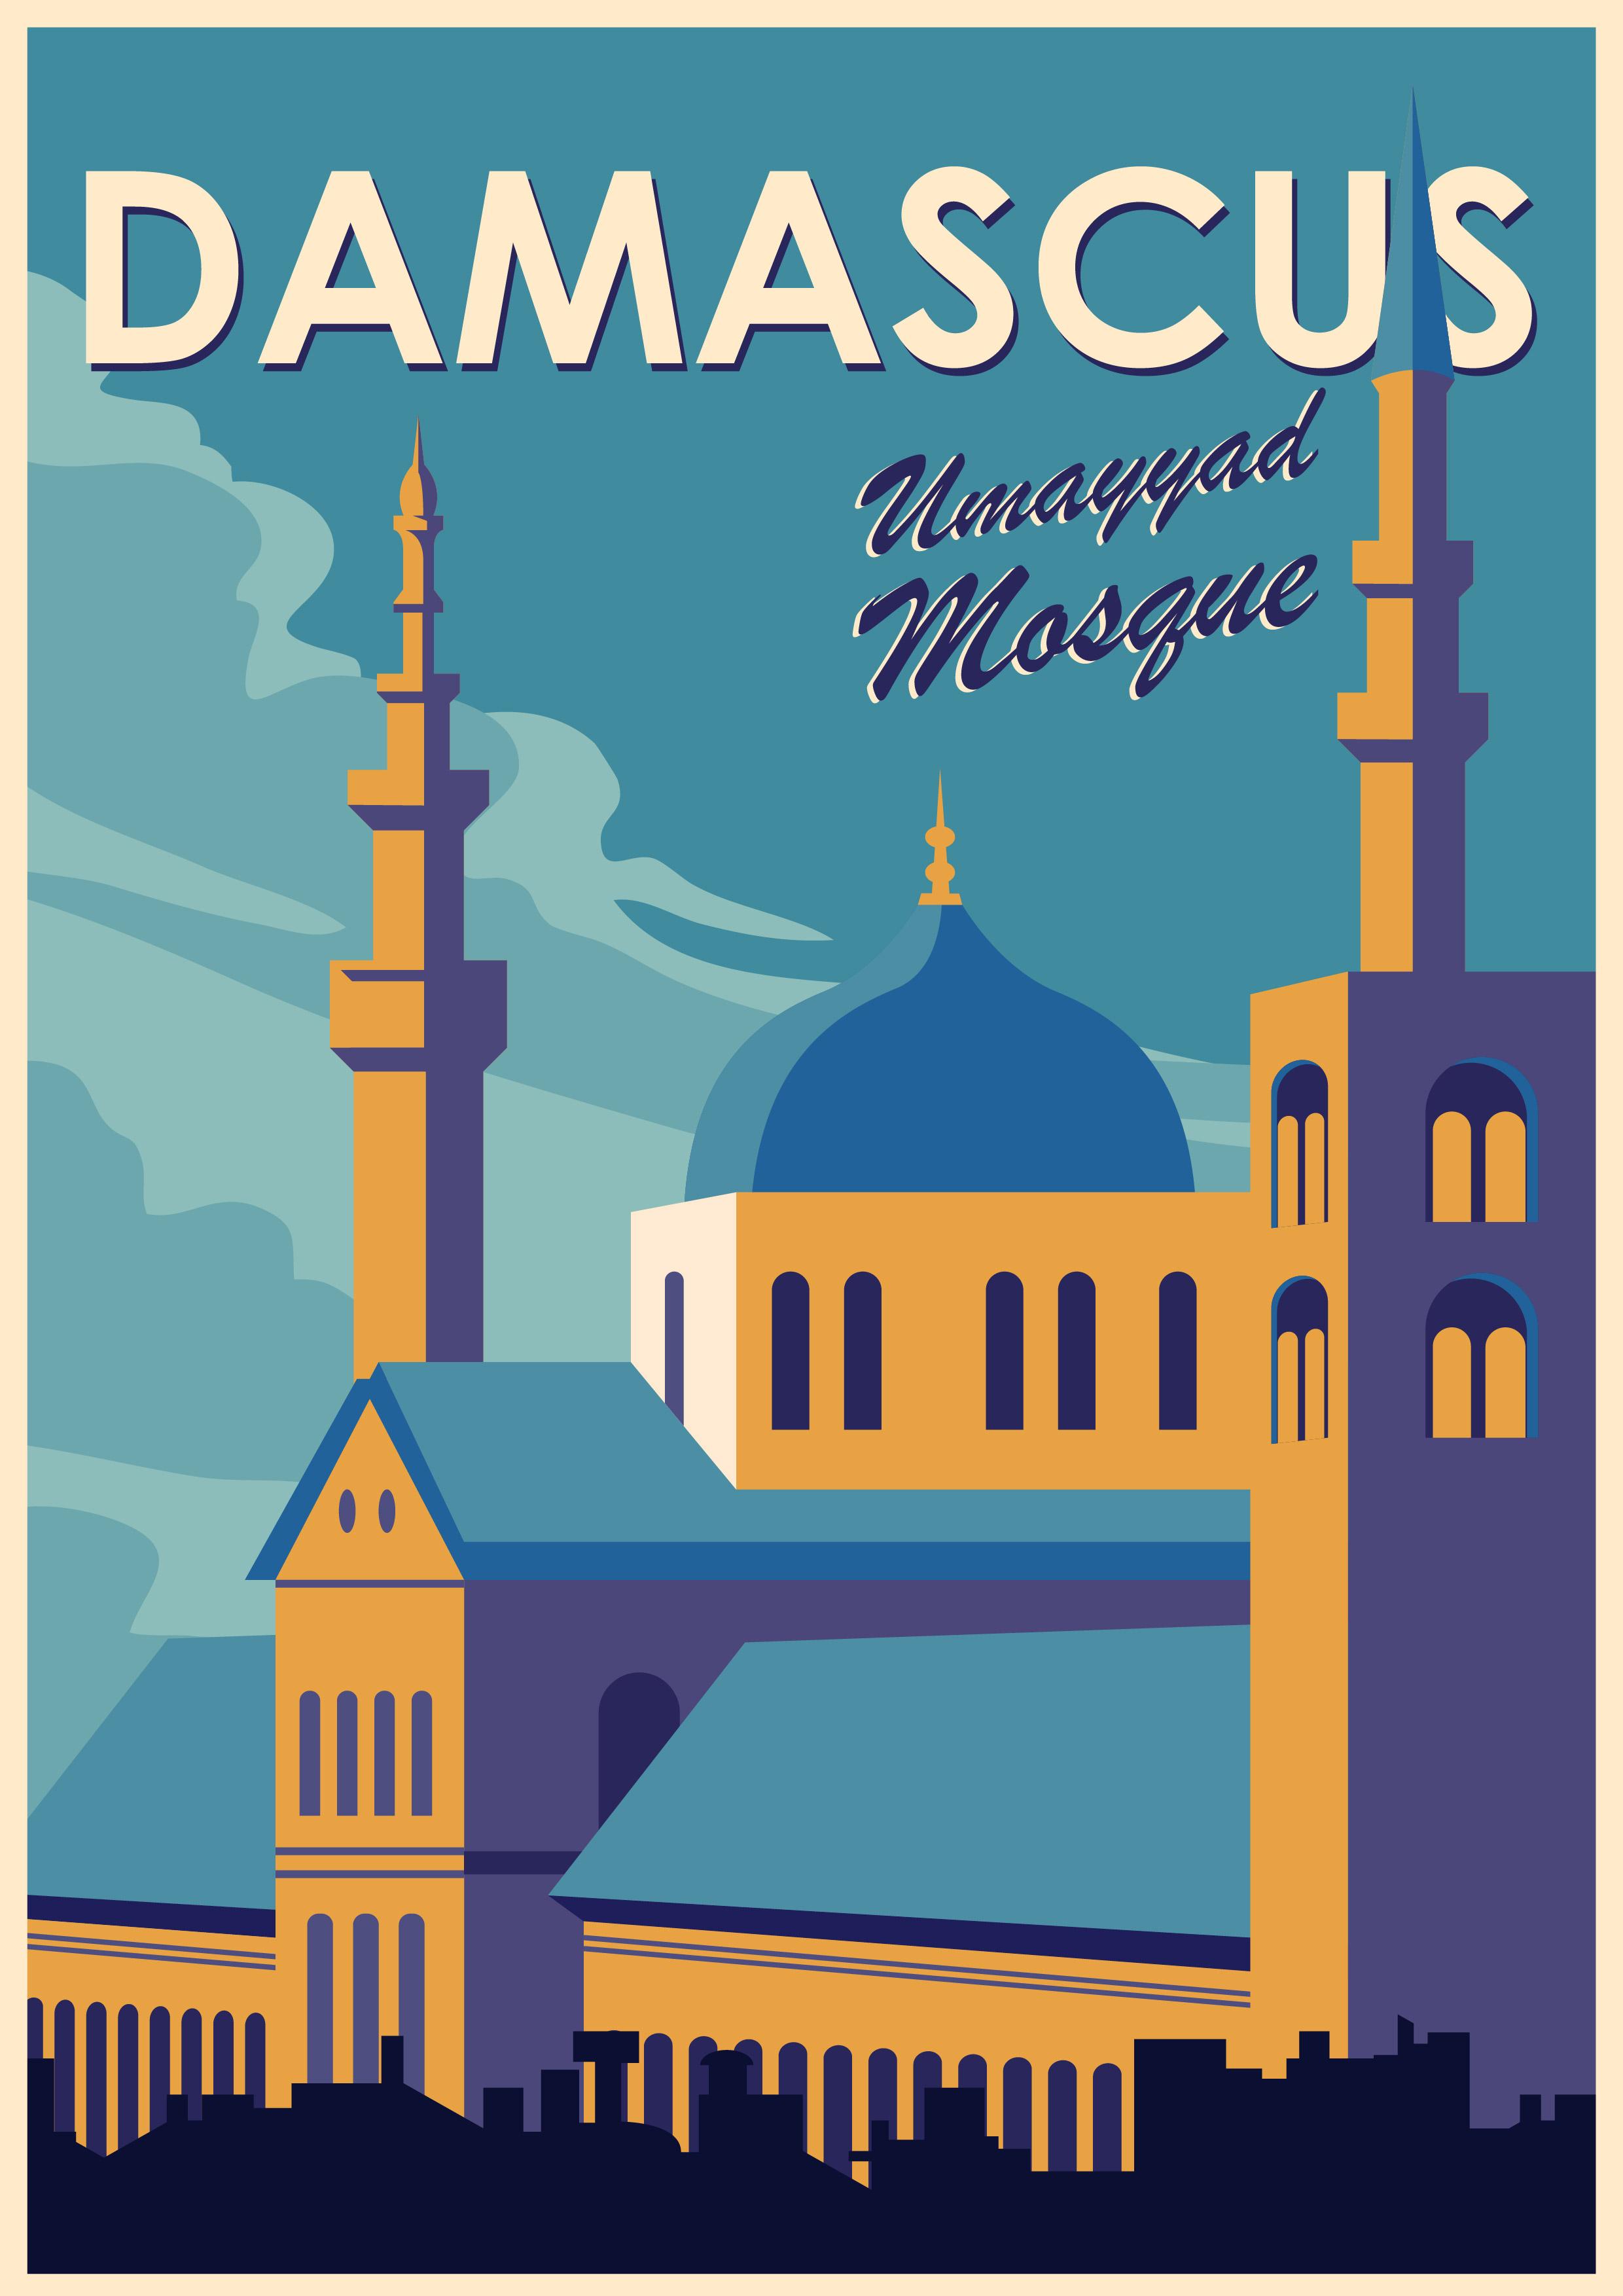 umayyad-mosque-damascus-vector